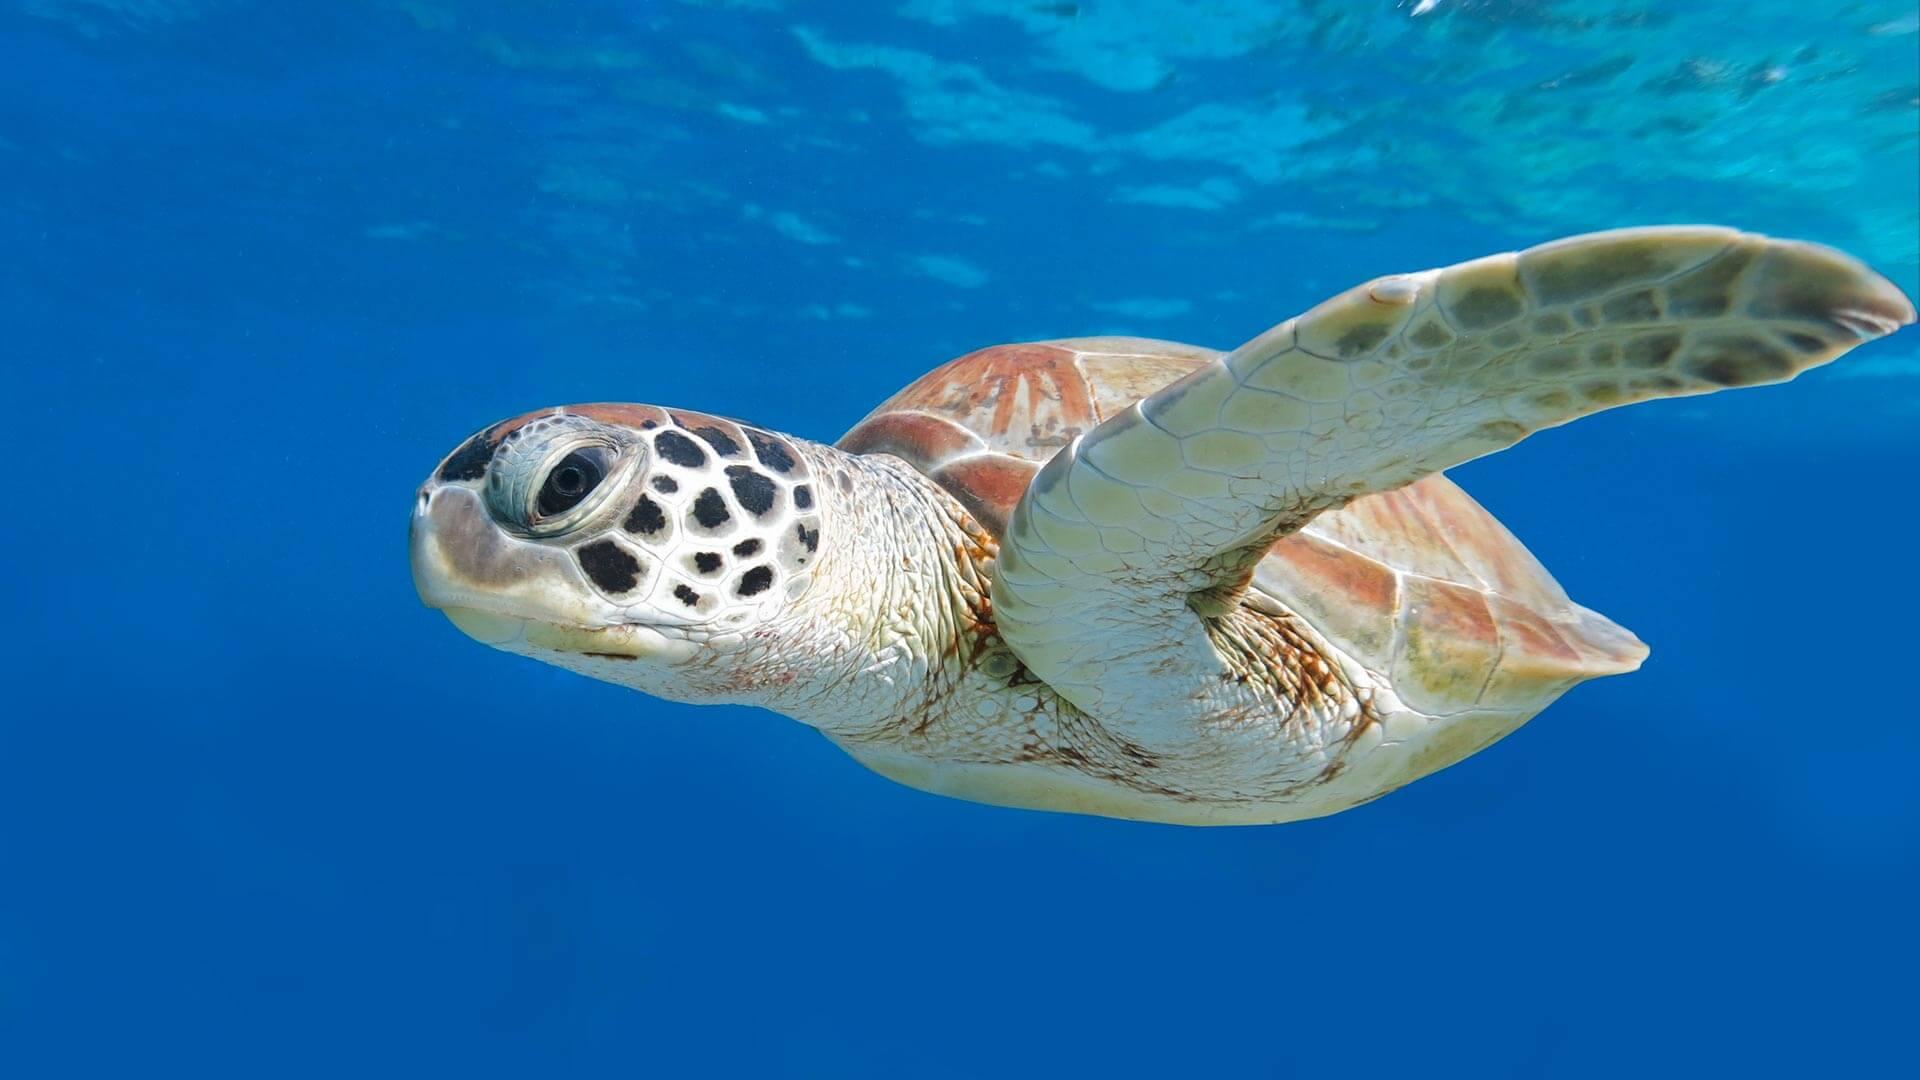 Are Turtle's the Coolest Underwater Creatures? · Aussie ...